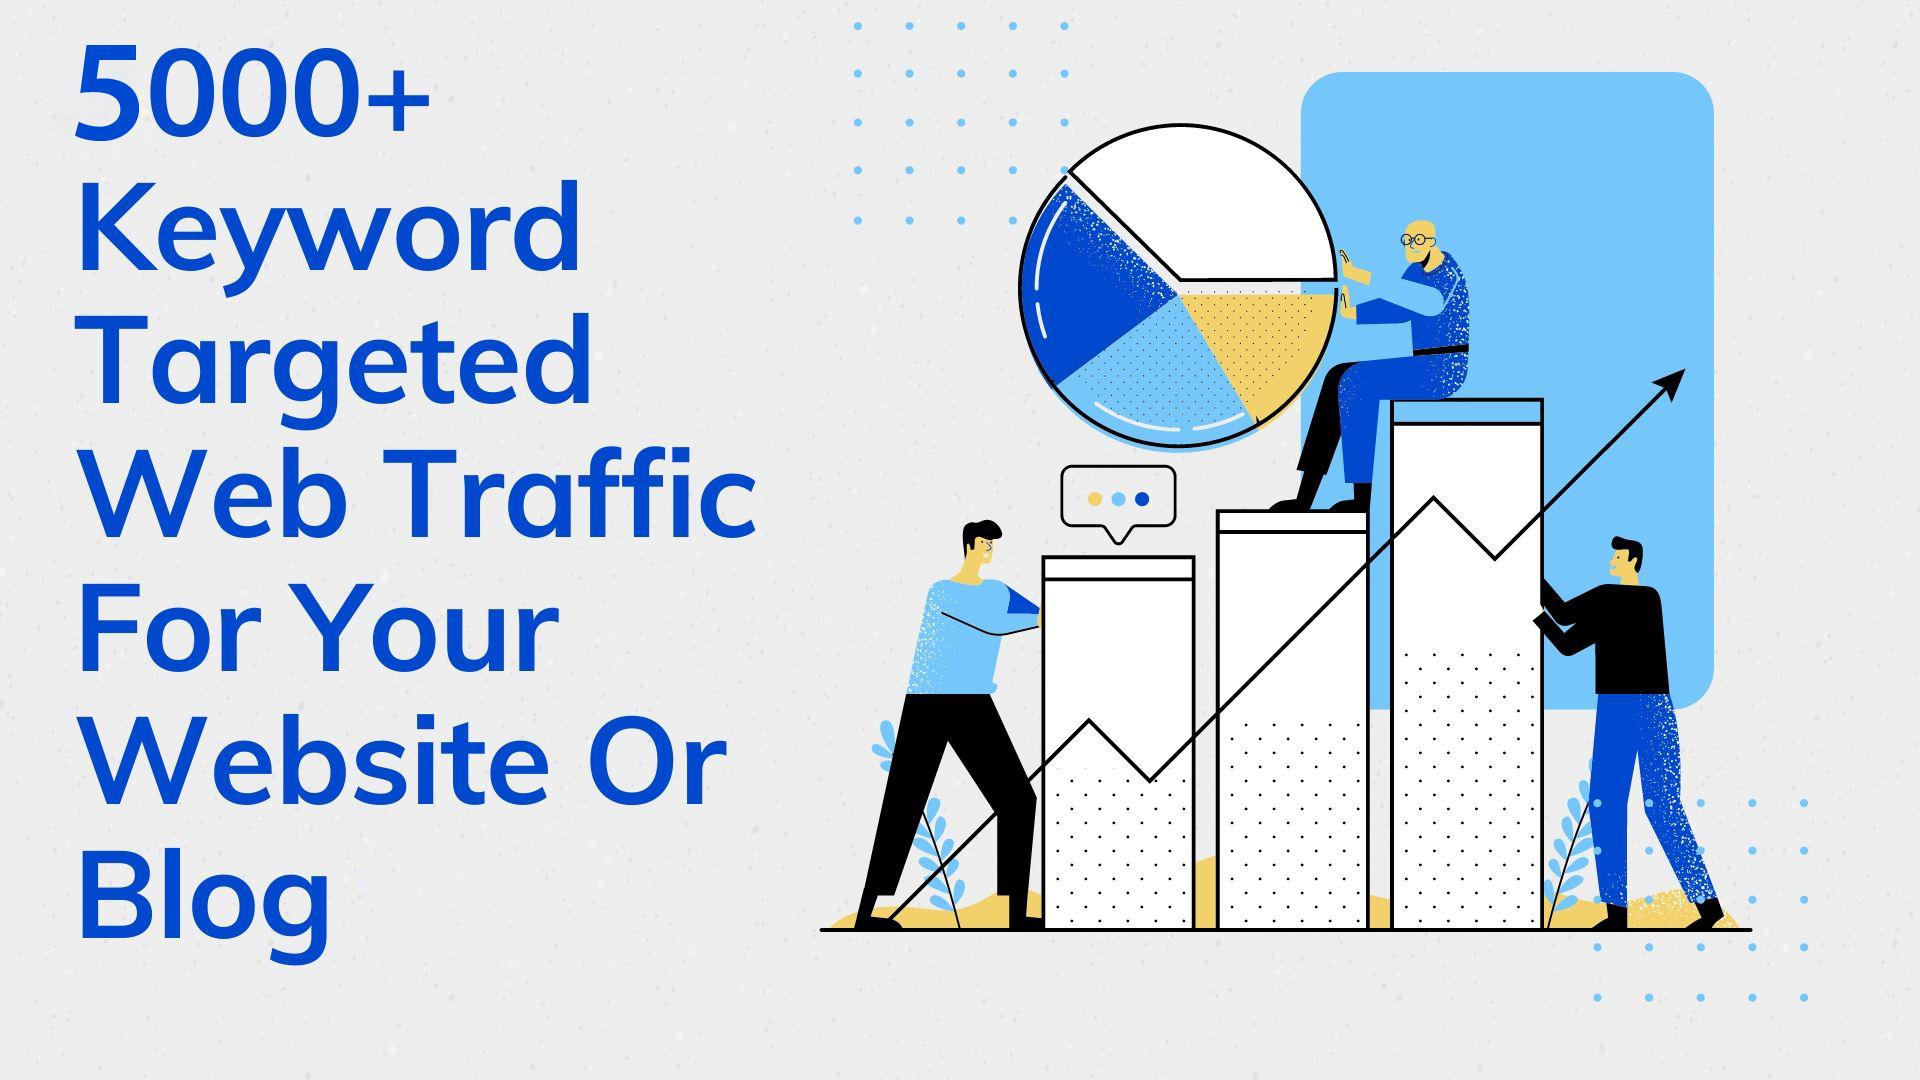 5000+ Keyword Targeted Web Traffic For Your Website Or Blog